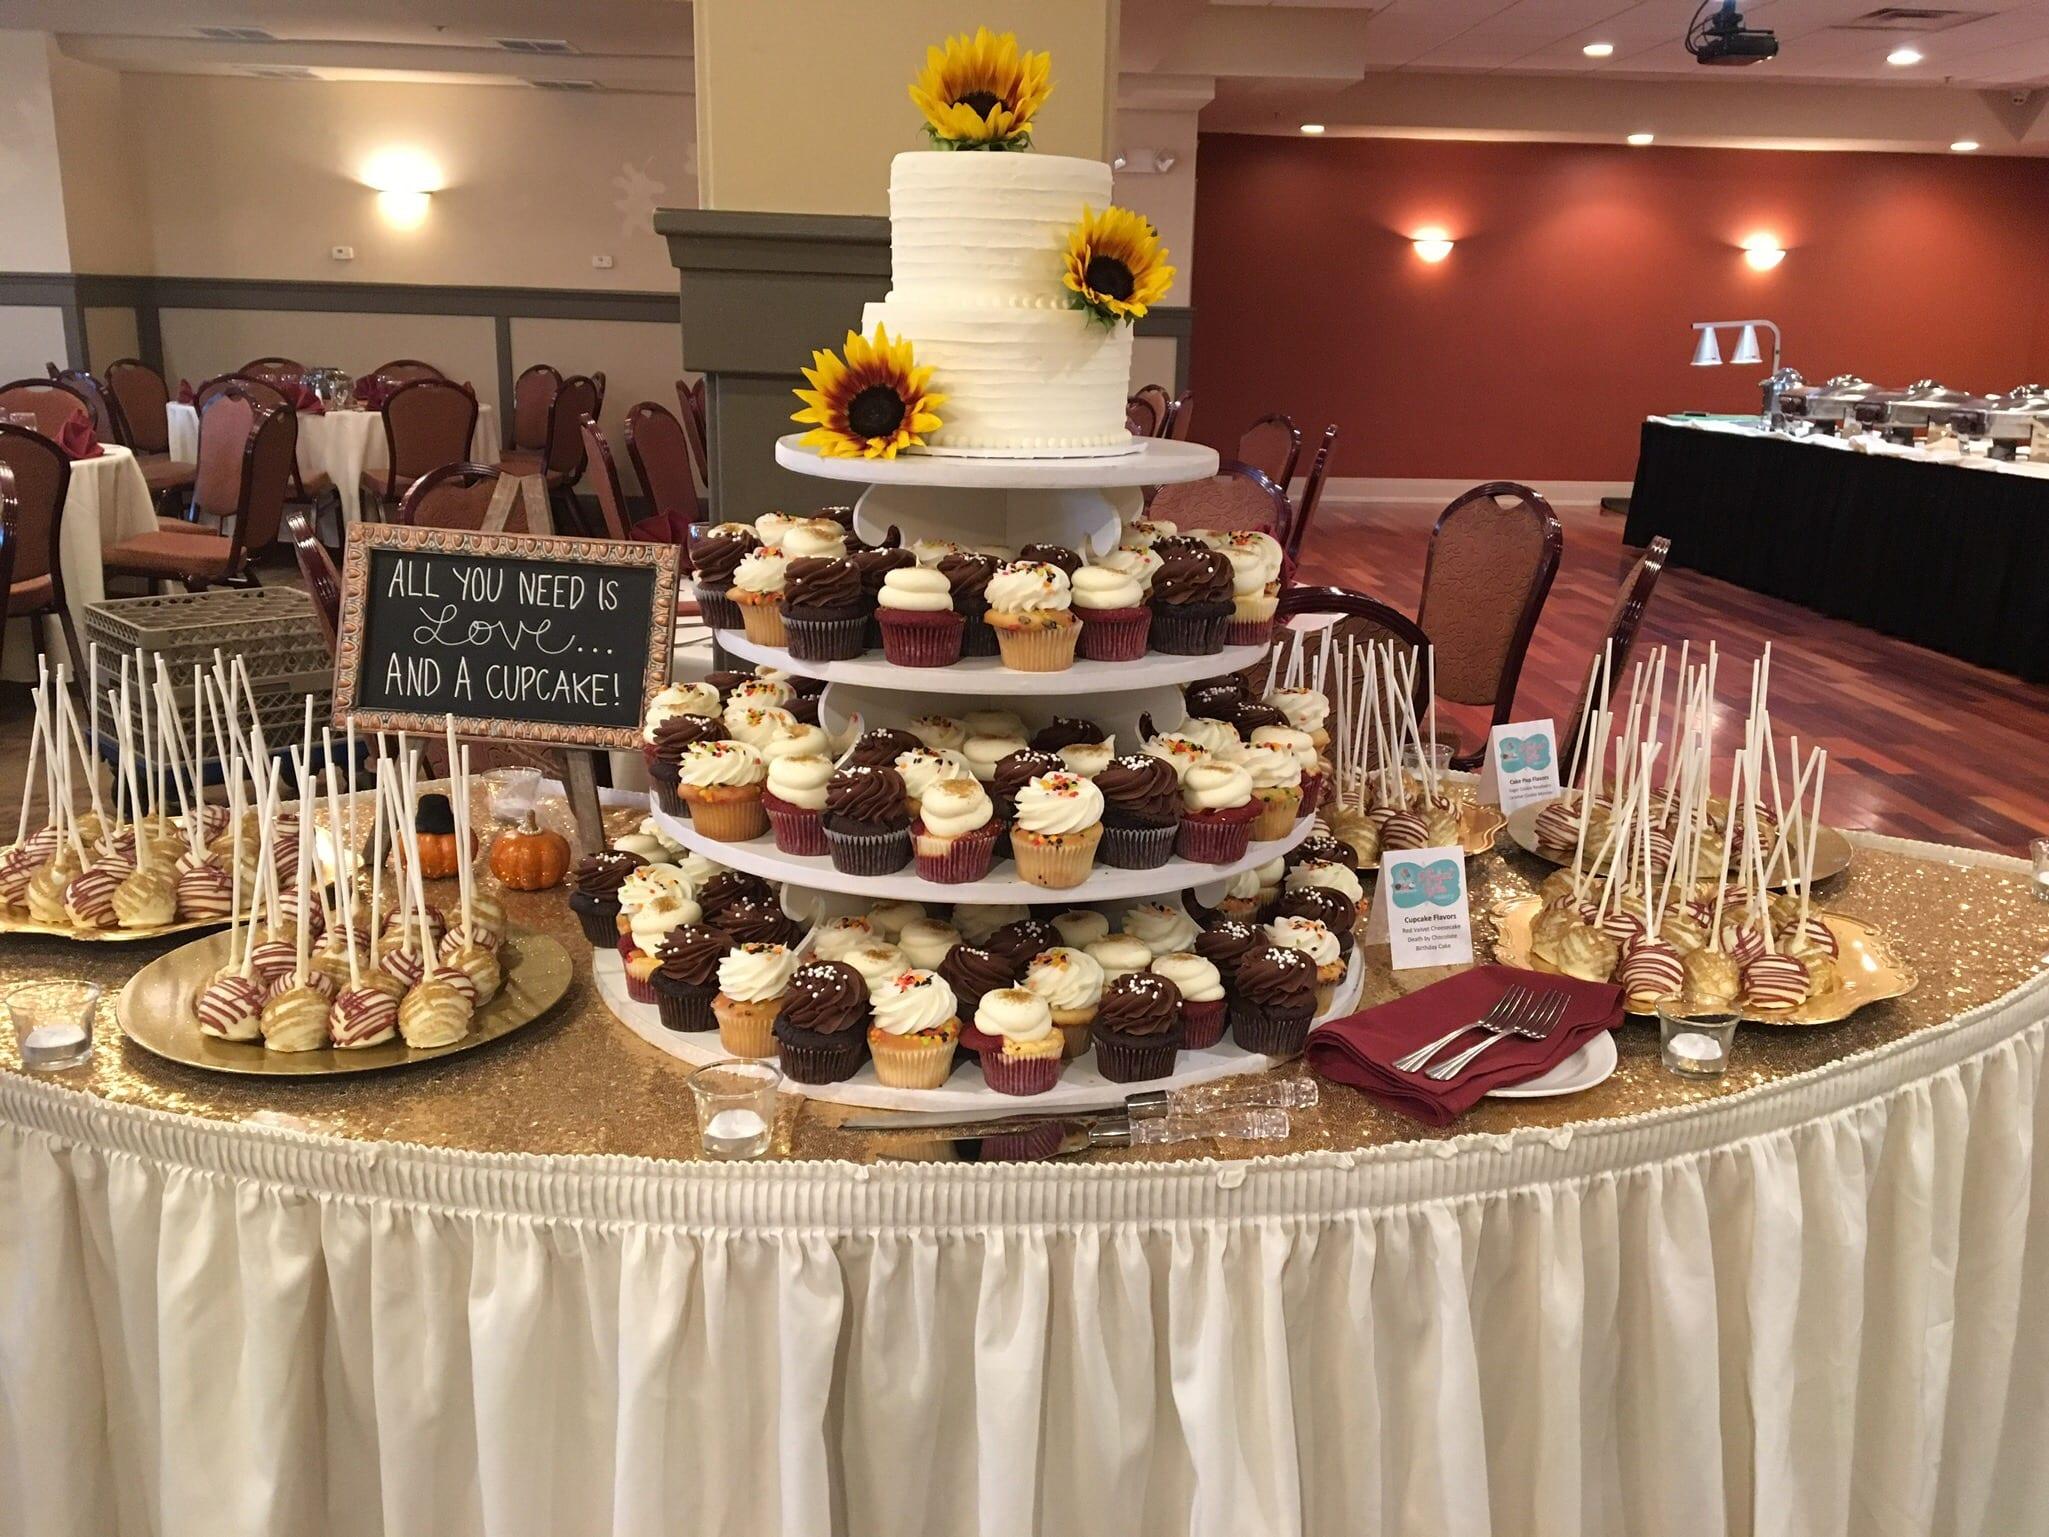 Fall Wedding Dessert Display with Sunflowers | 3 Sweet Girls Cakery